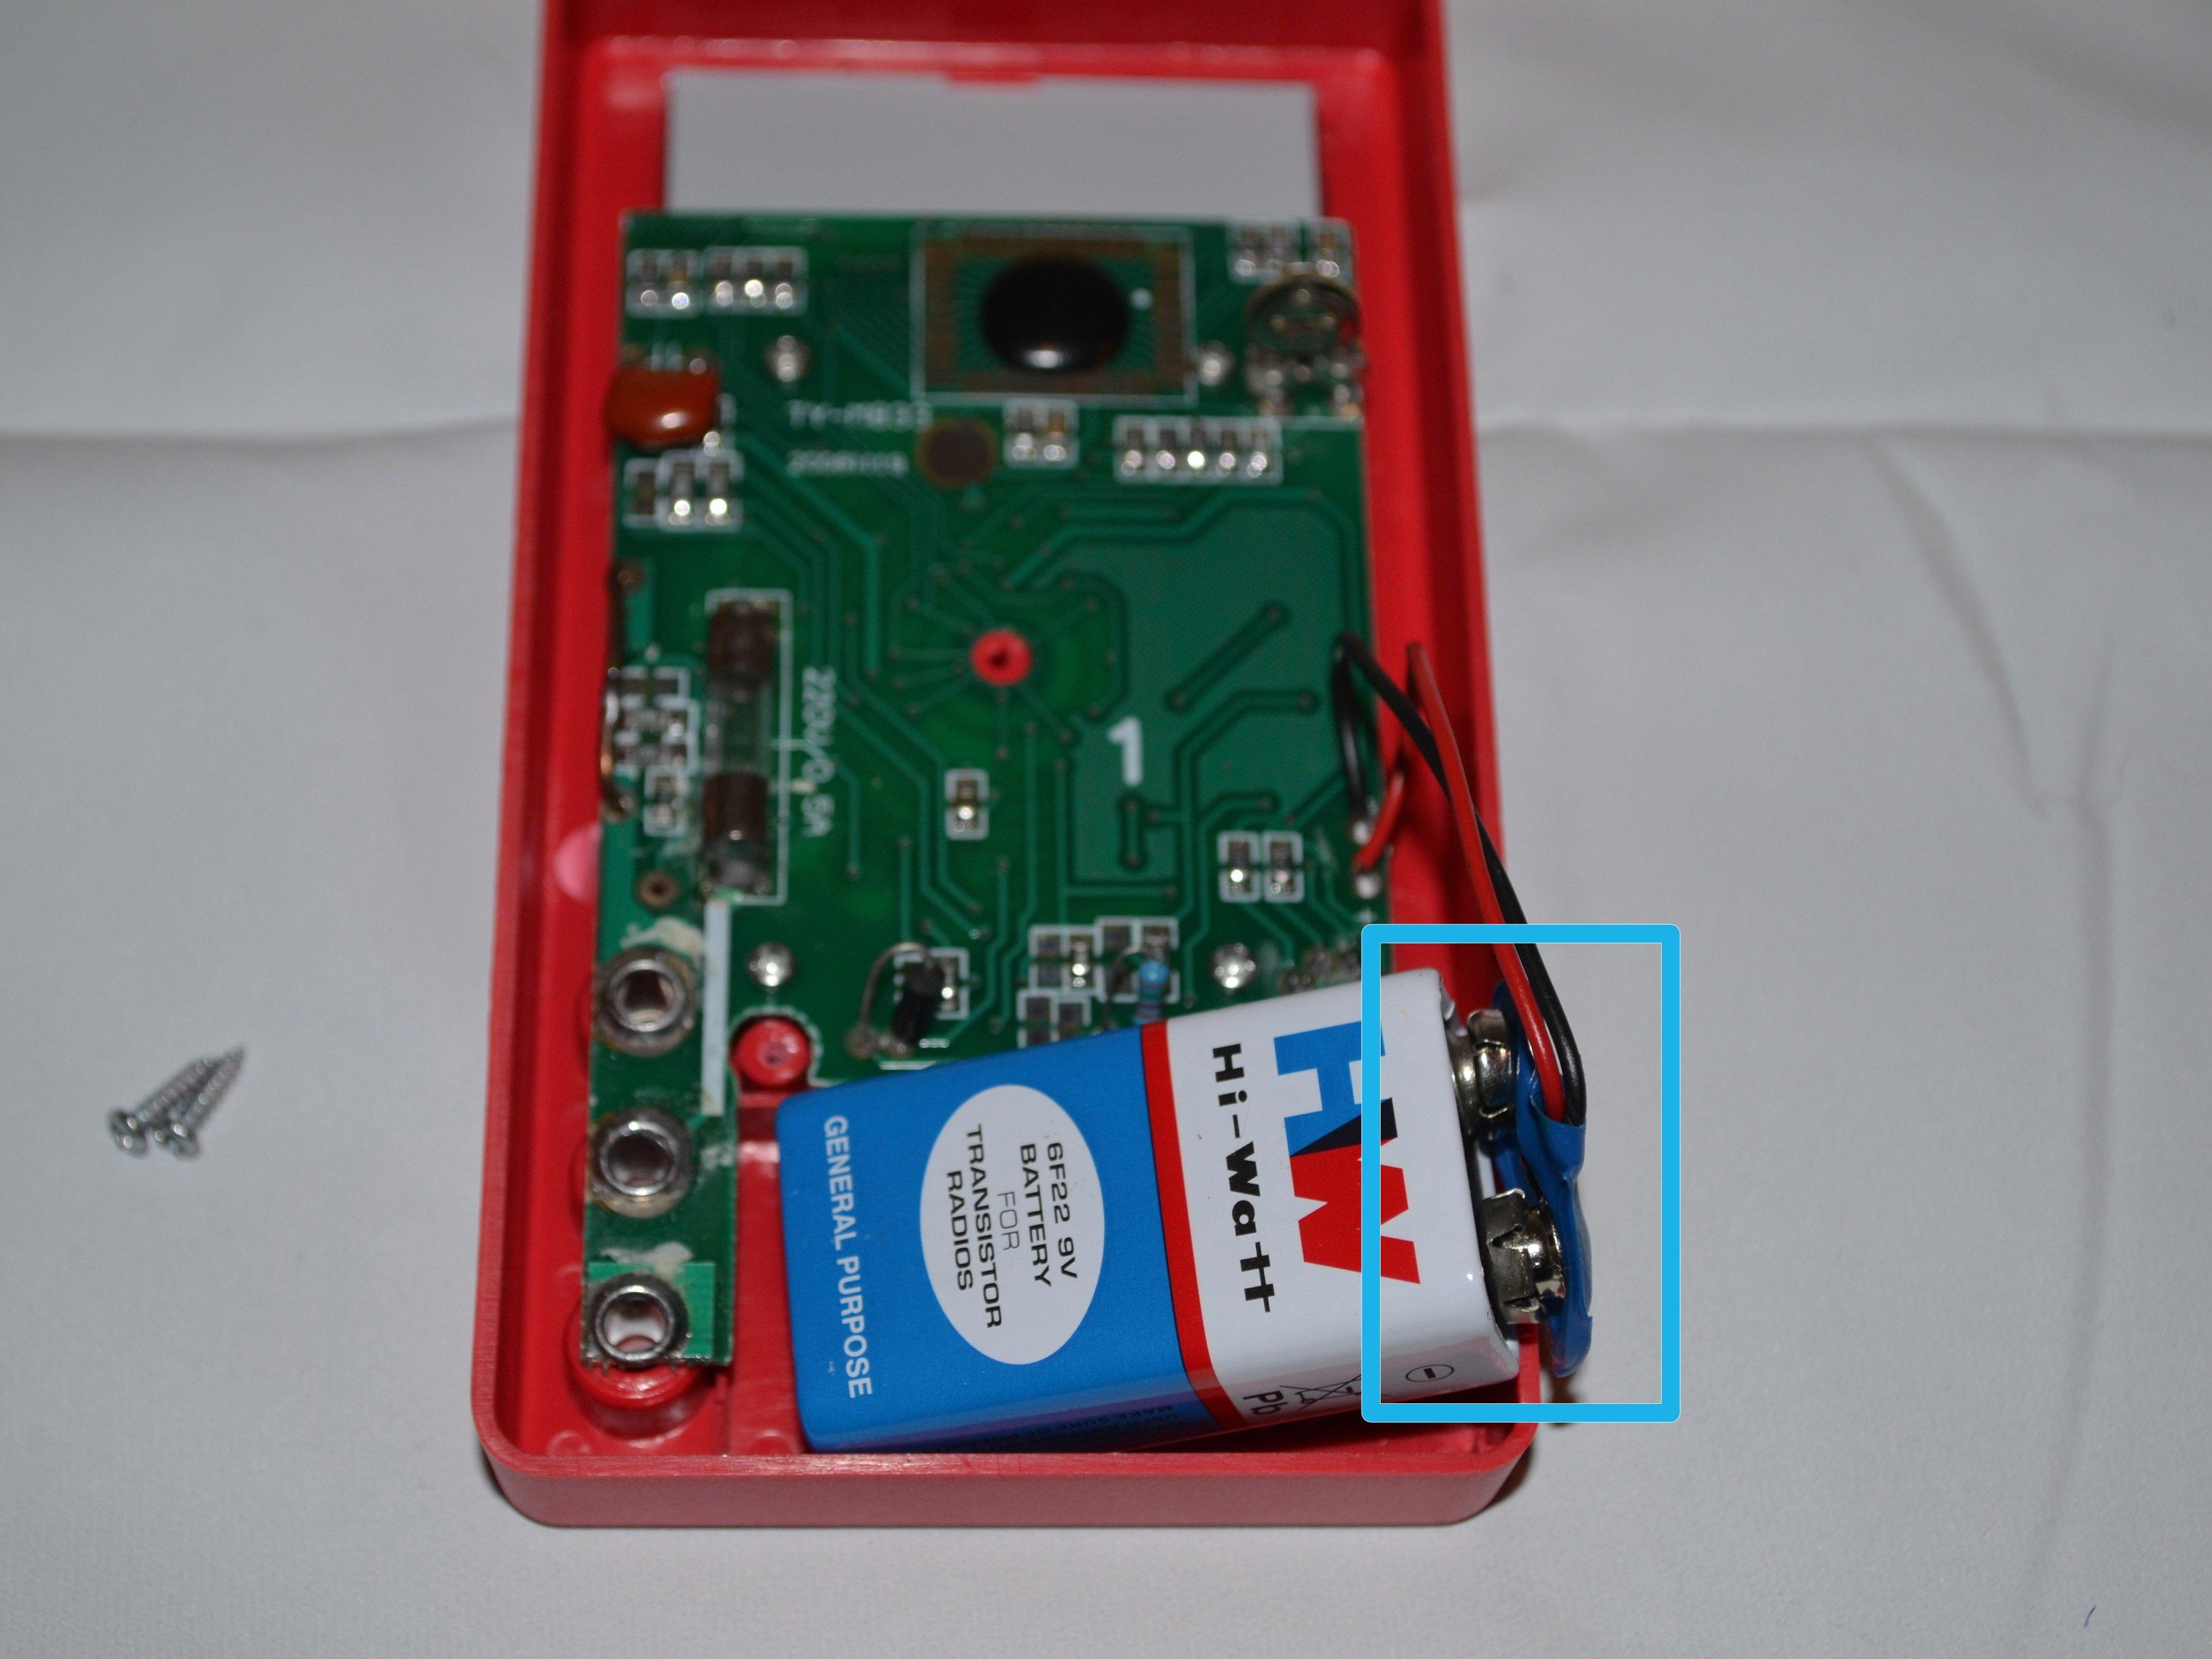 Cen-Tech Seven Function Digital Multimeter Battery Replacement